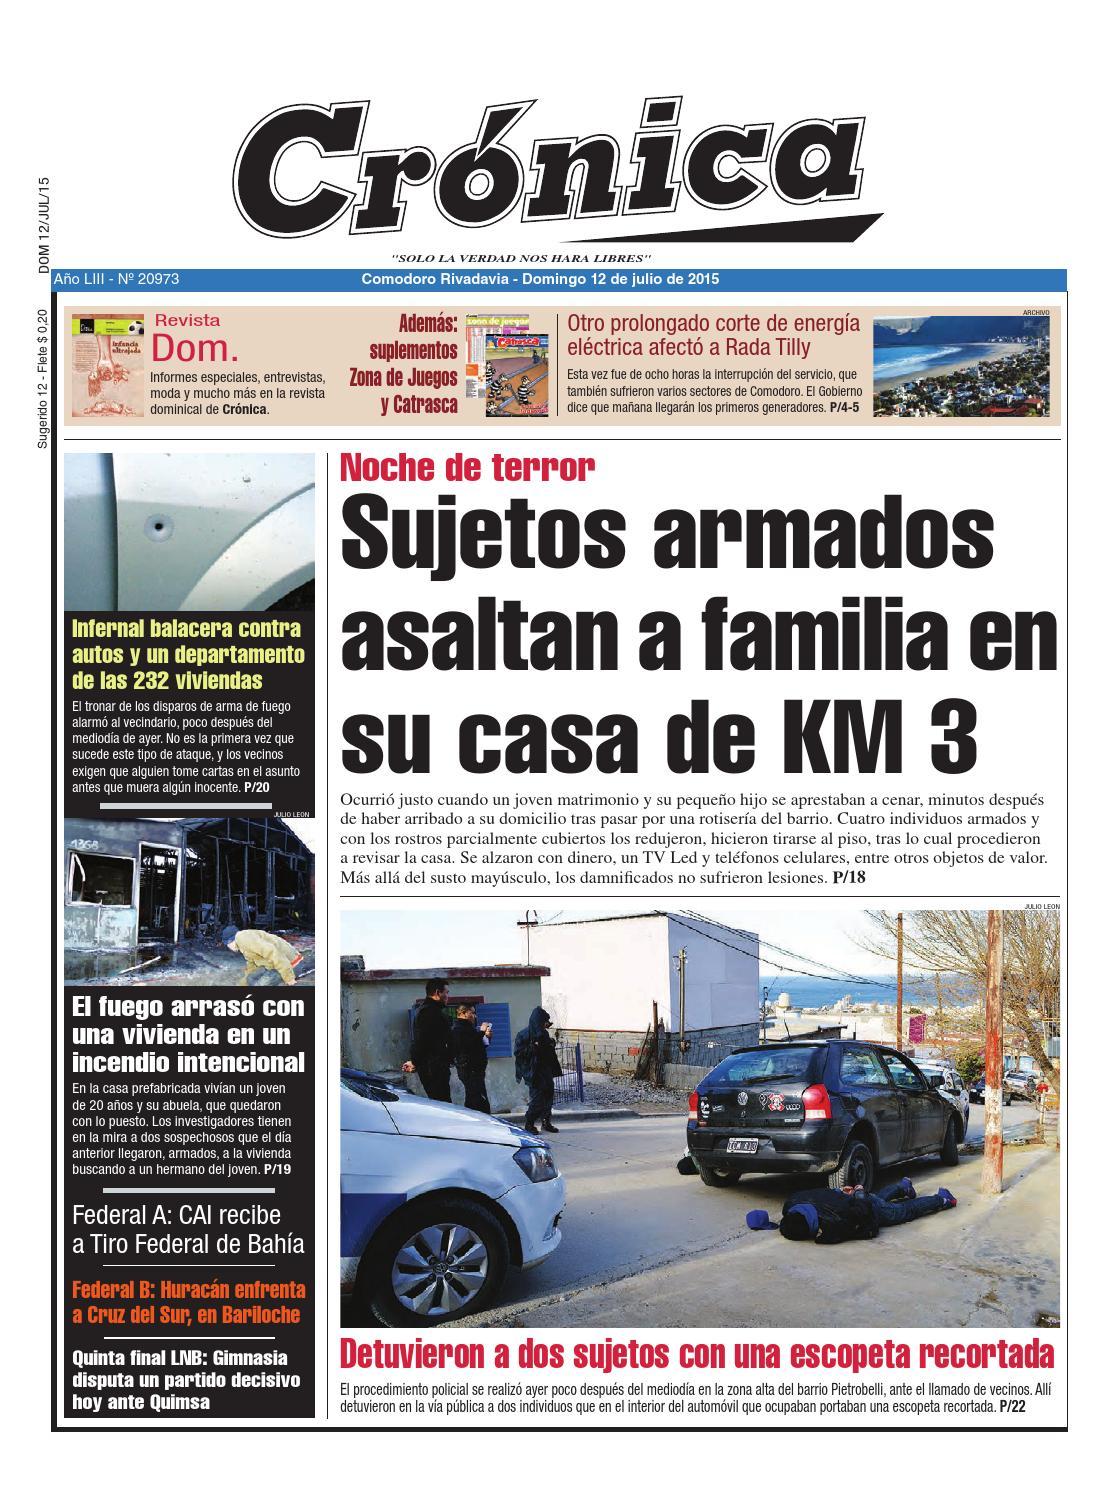 D8e23601fdd4e36a4cc05169eb6ed2be by Diario Crónica - issuu